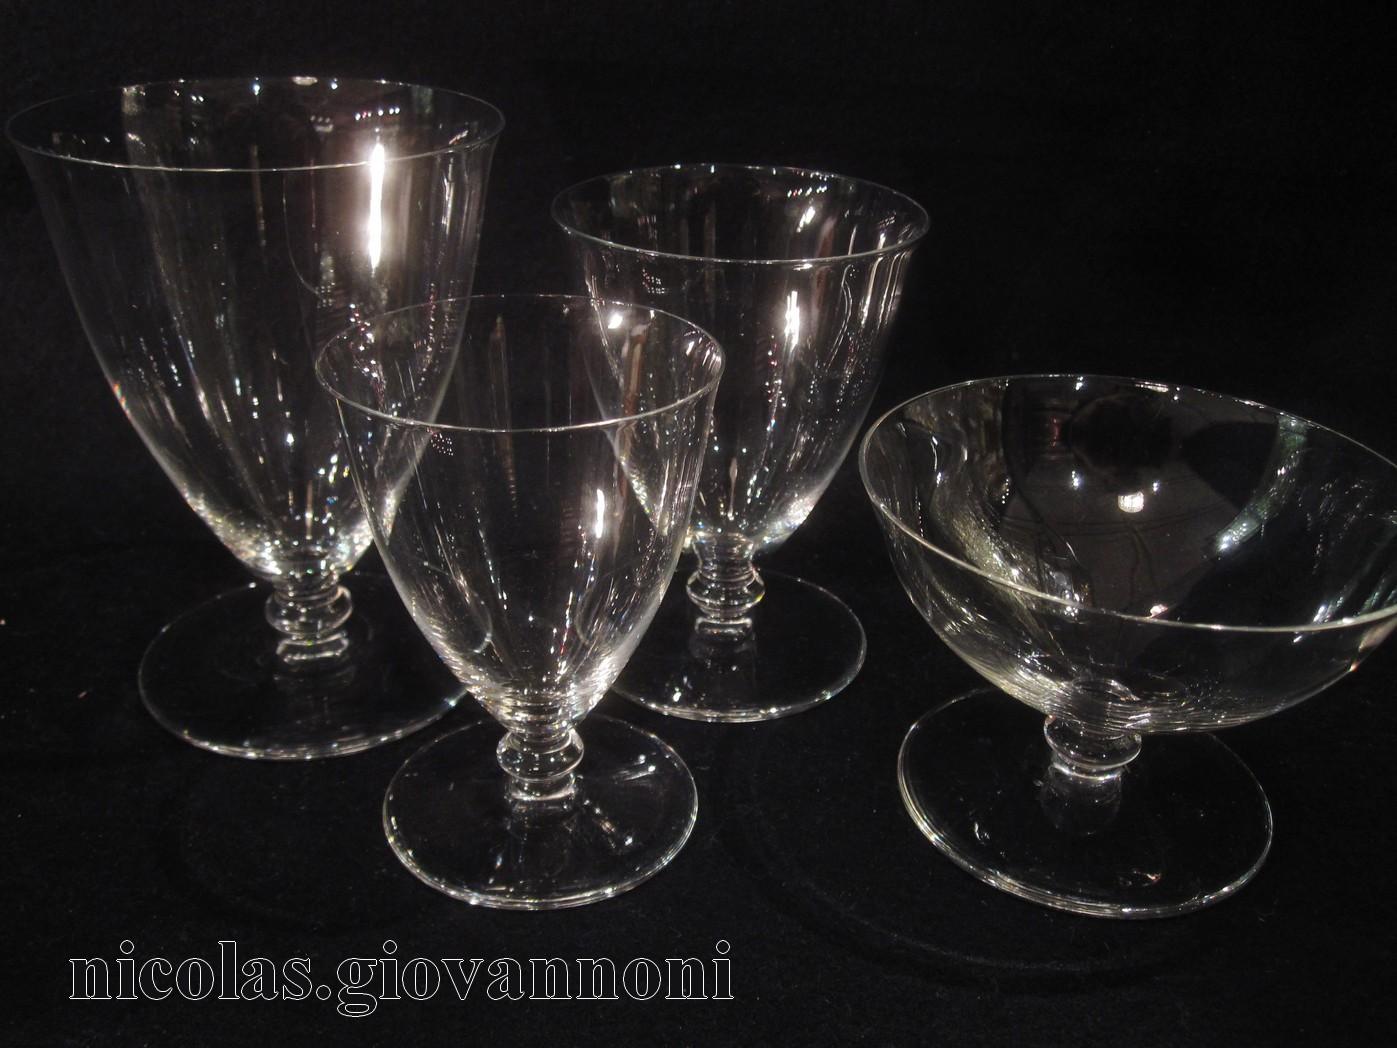 service 52 verres 2 carafes 1 broc murcie baccarat cristal catalogue cristal de. Black Bedroom Furniture Sets. Home Design Ideas